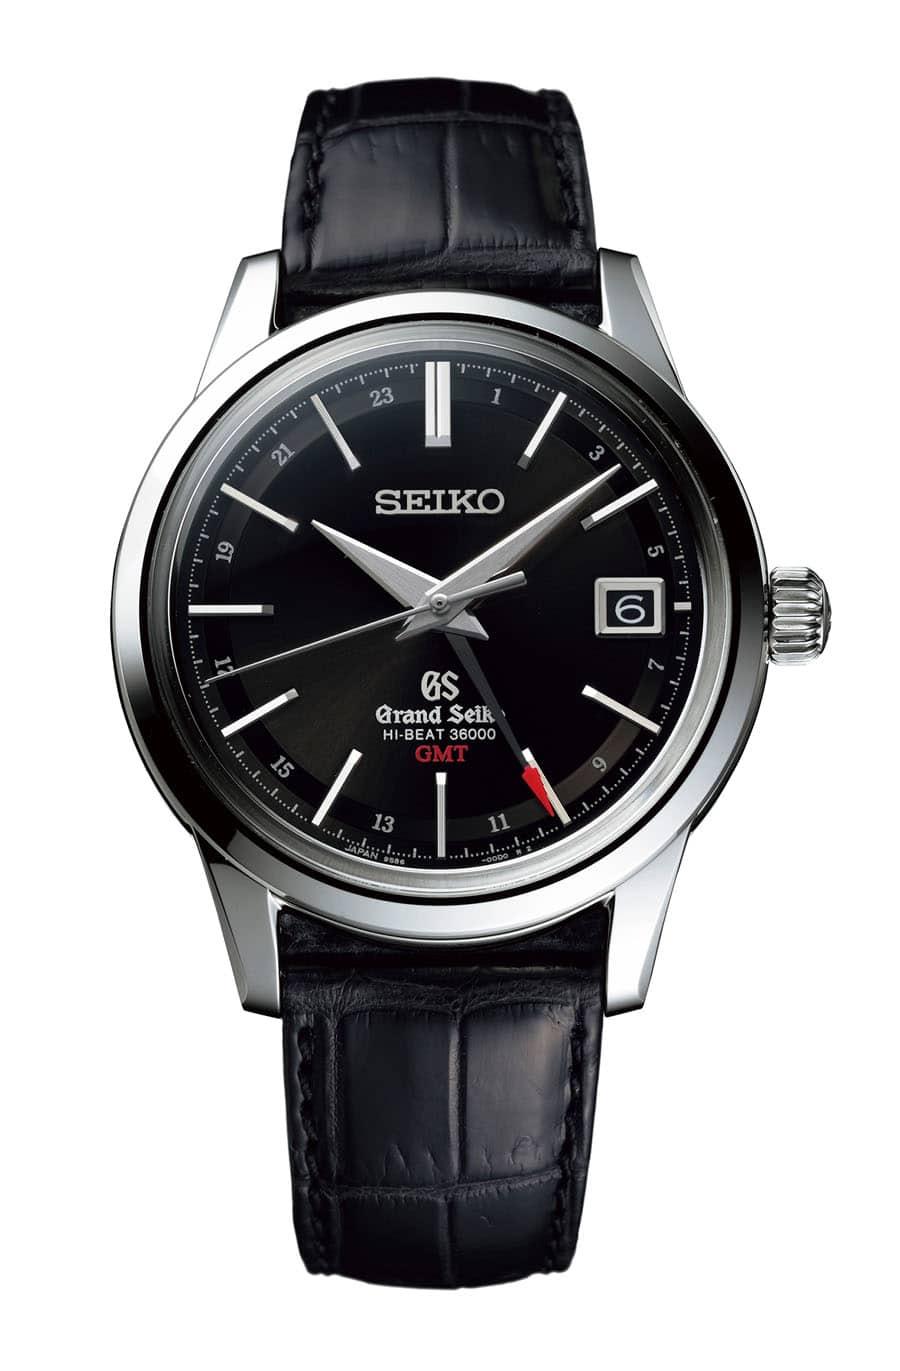 Seiko: Hi-Beat 36.000 GMT Limited Edition SBGJ021